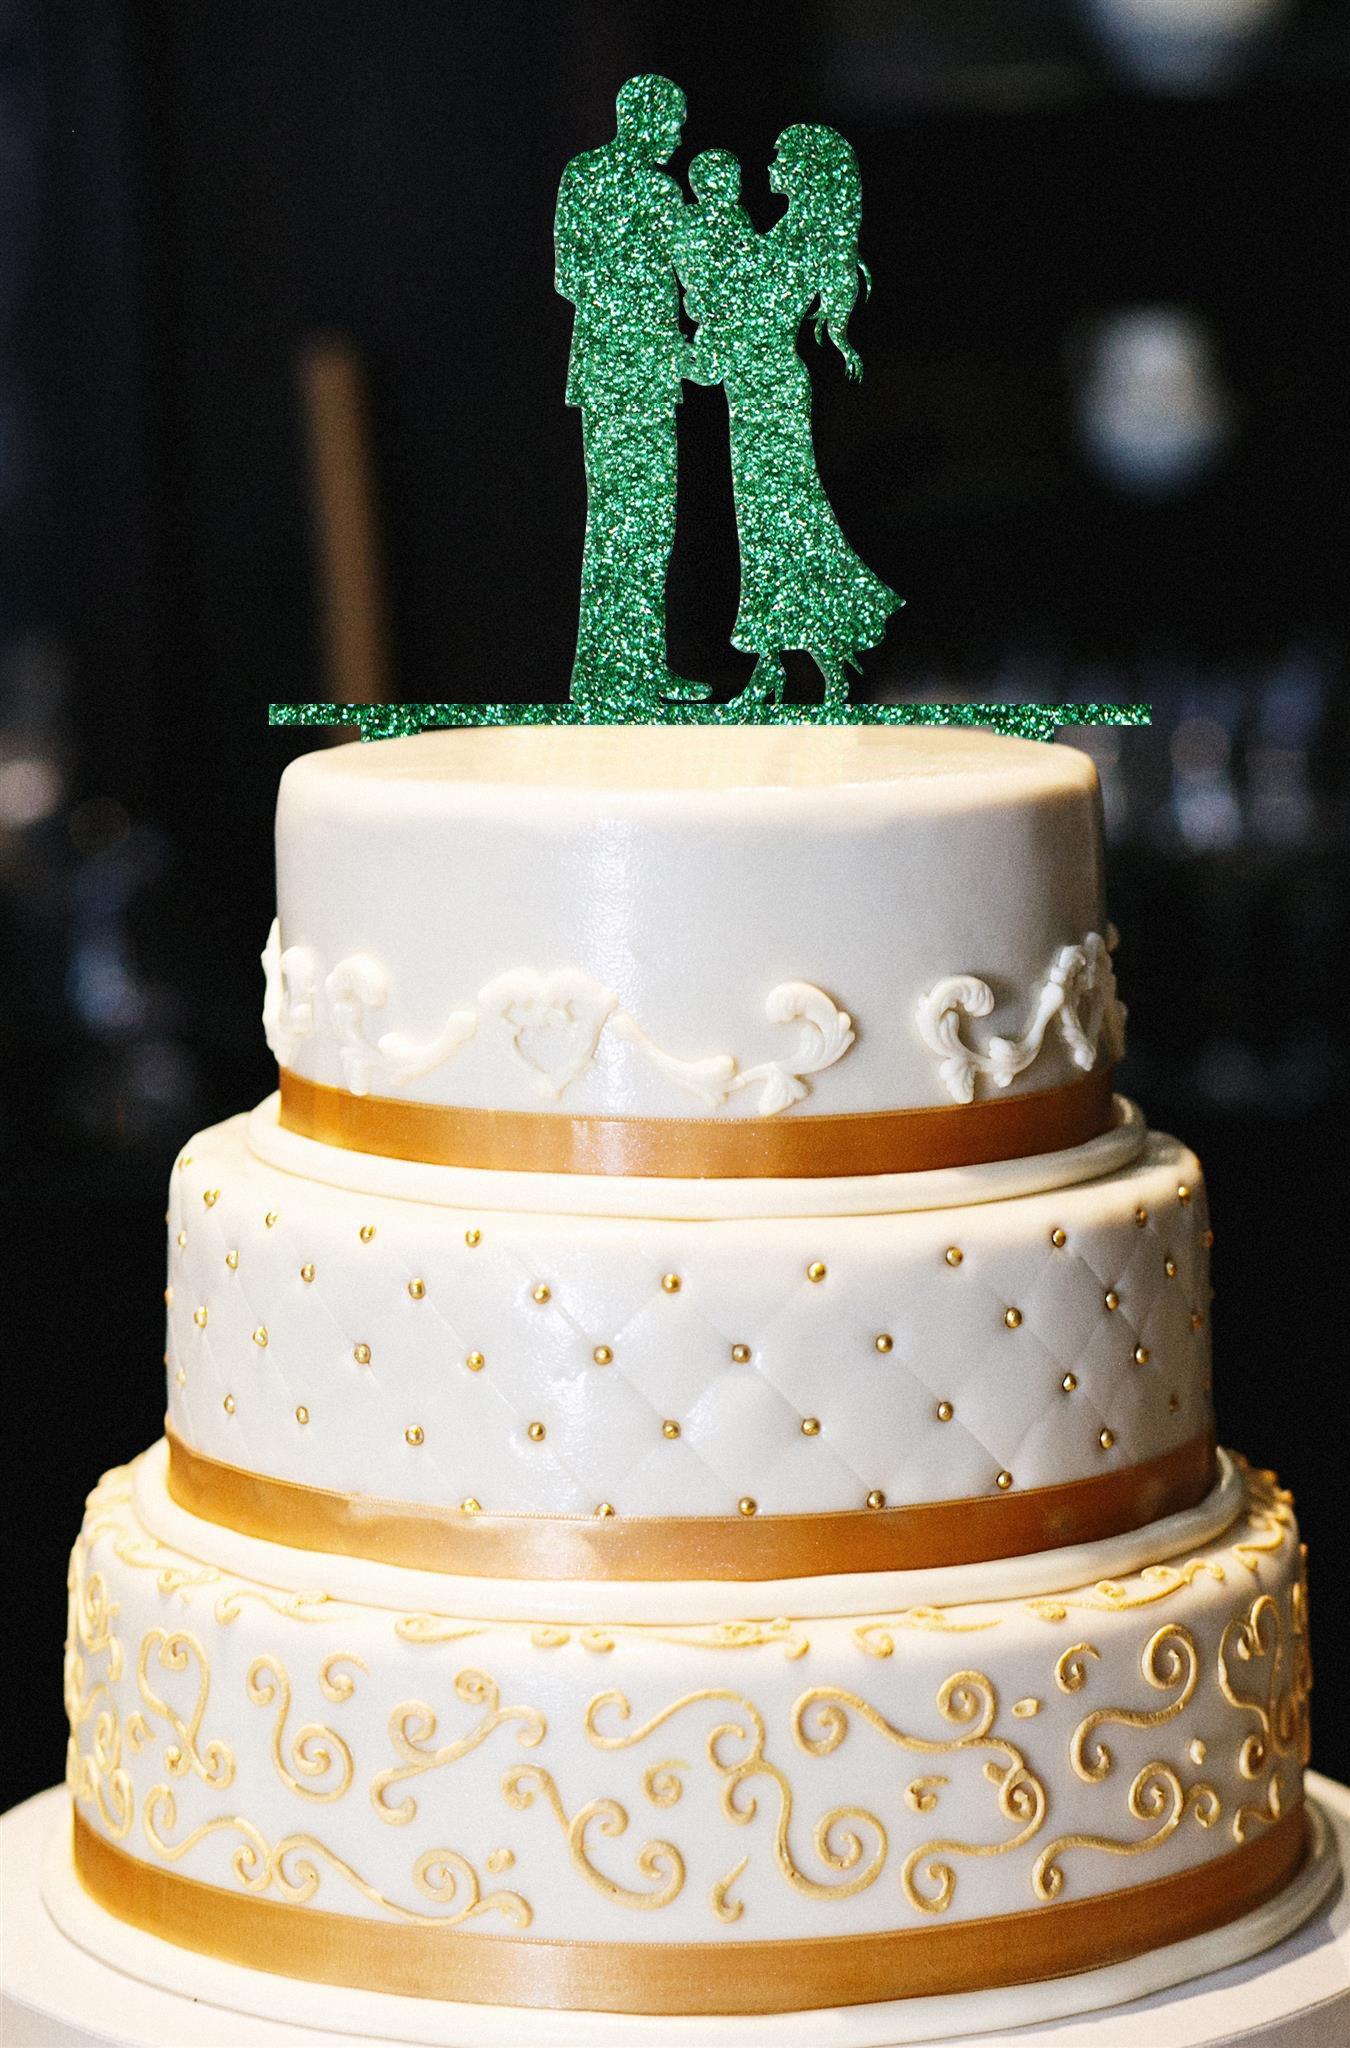 Mr. & Mrs. with Baby Wedding Cake Topper, Glitter Wedding Cake Topper, Engagement Cake Topper, Gold Cake Topper, Gold Glitter Cake Topper (14'', Glitter Emerald)